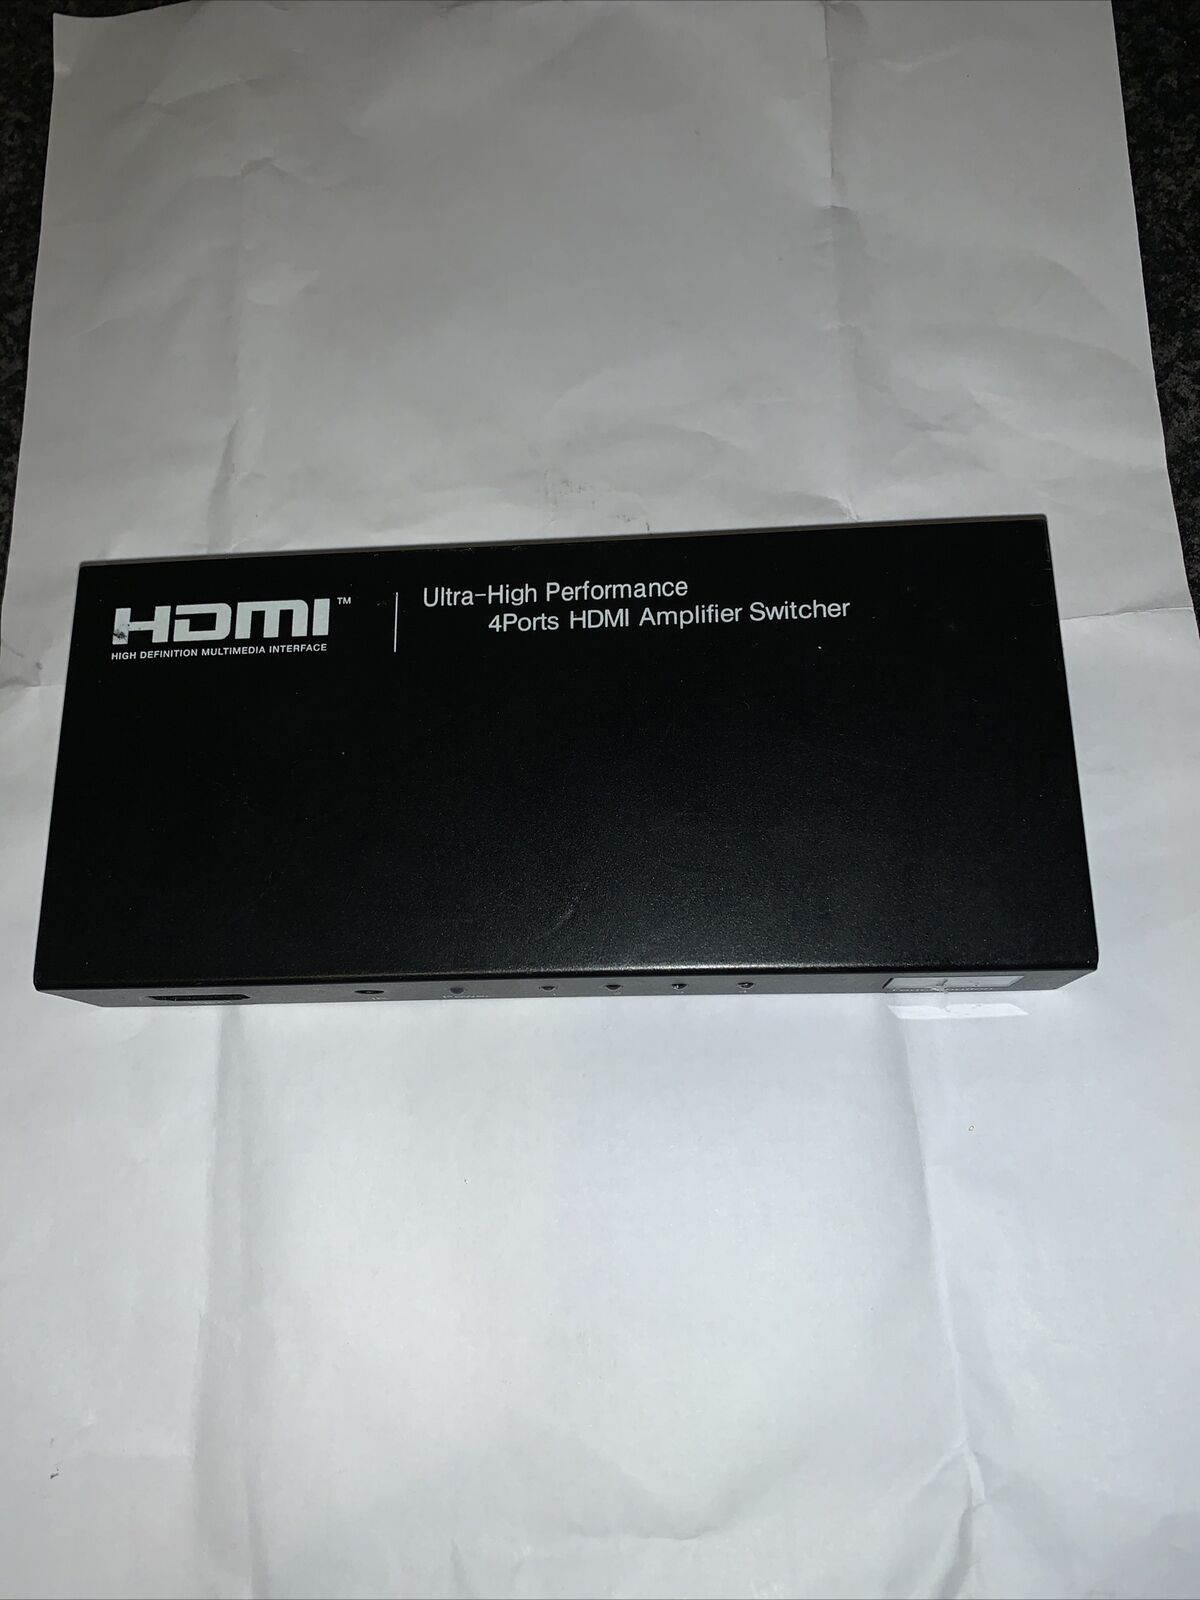 HDMI 4ports Amplifer Switcher